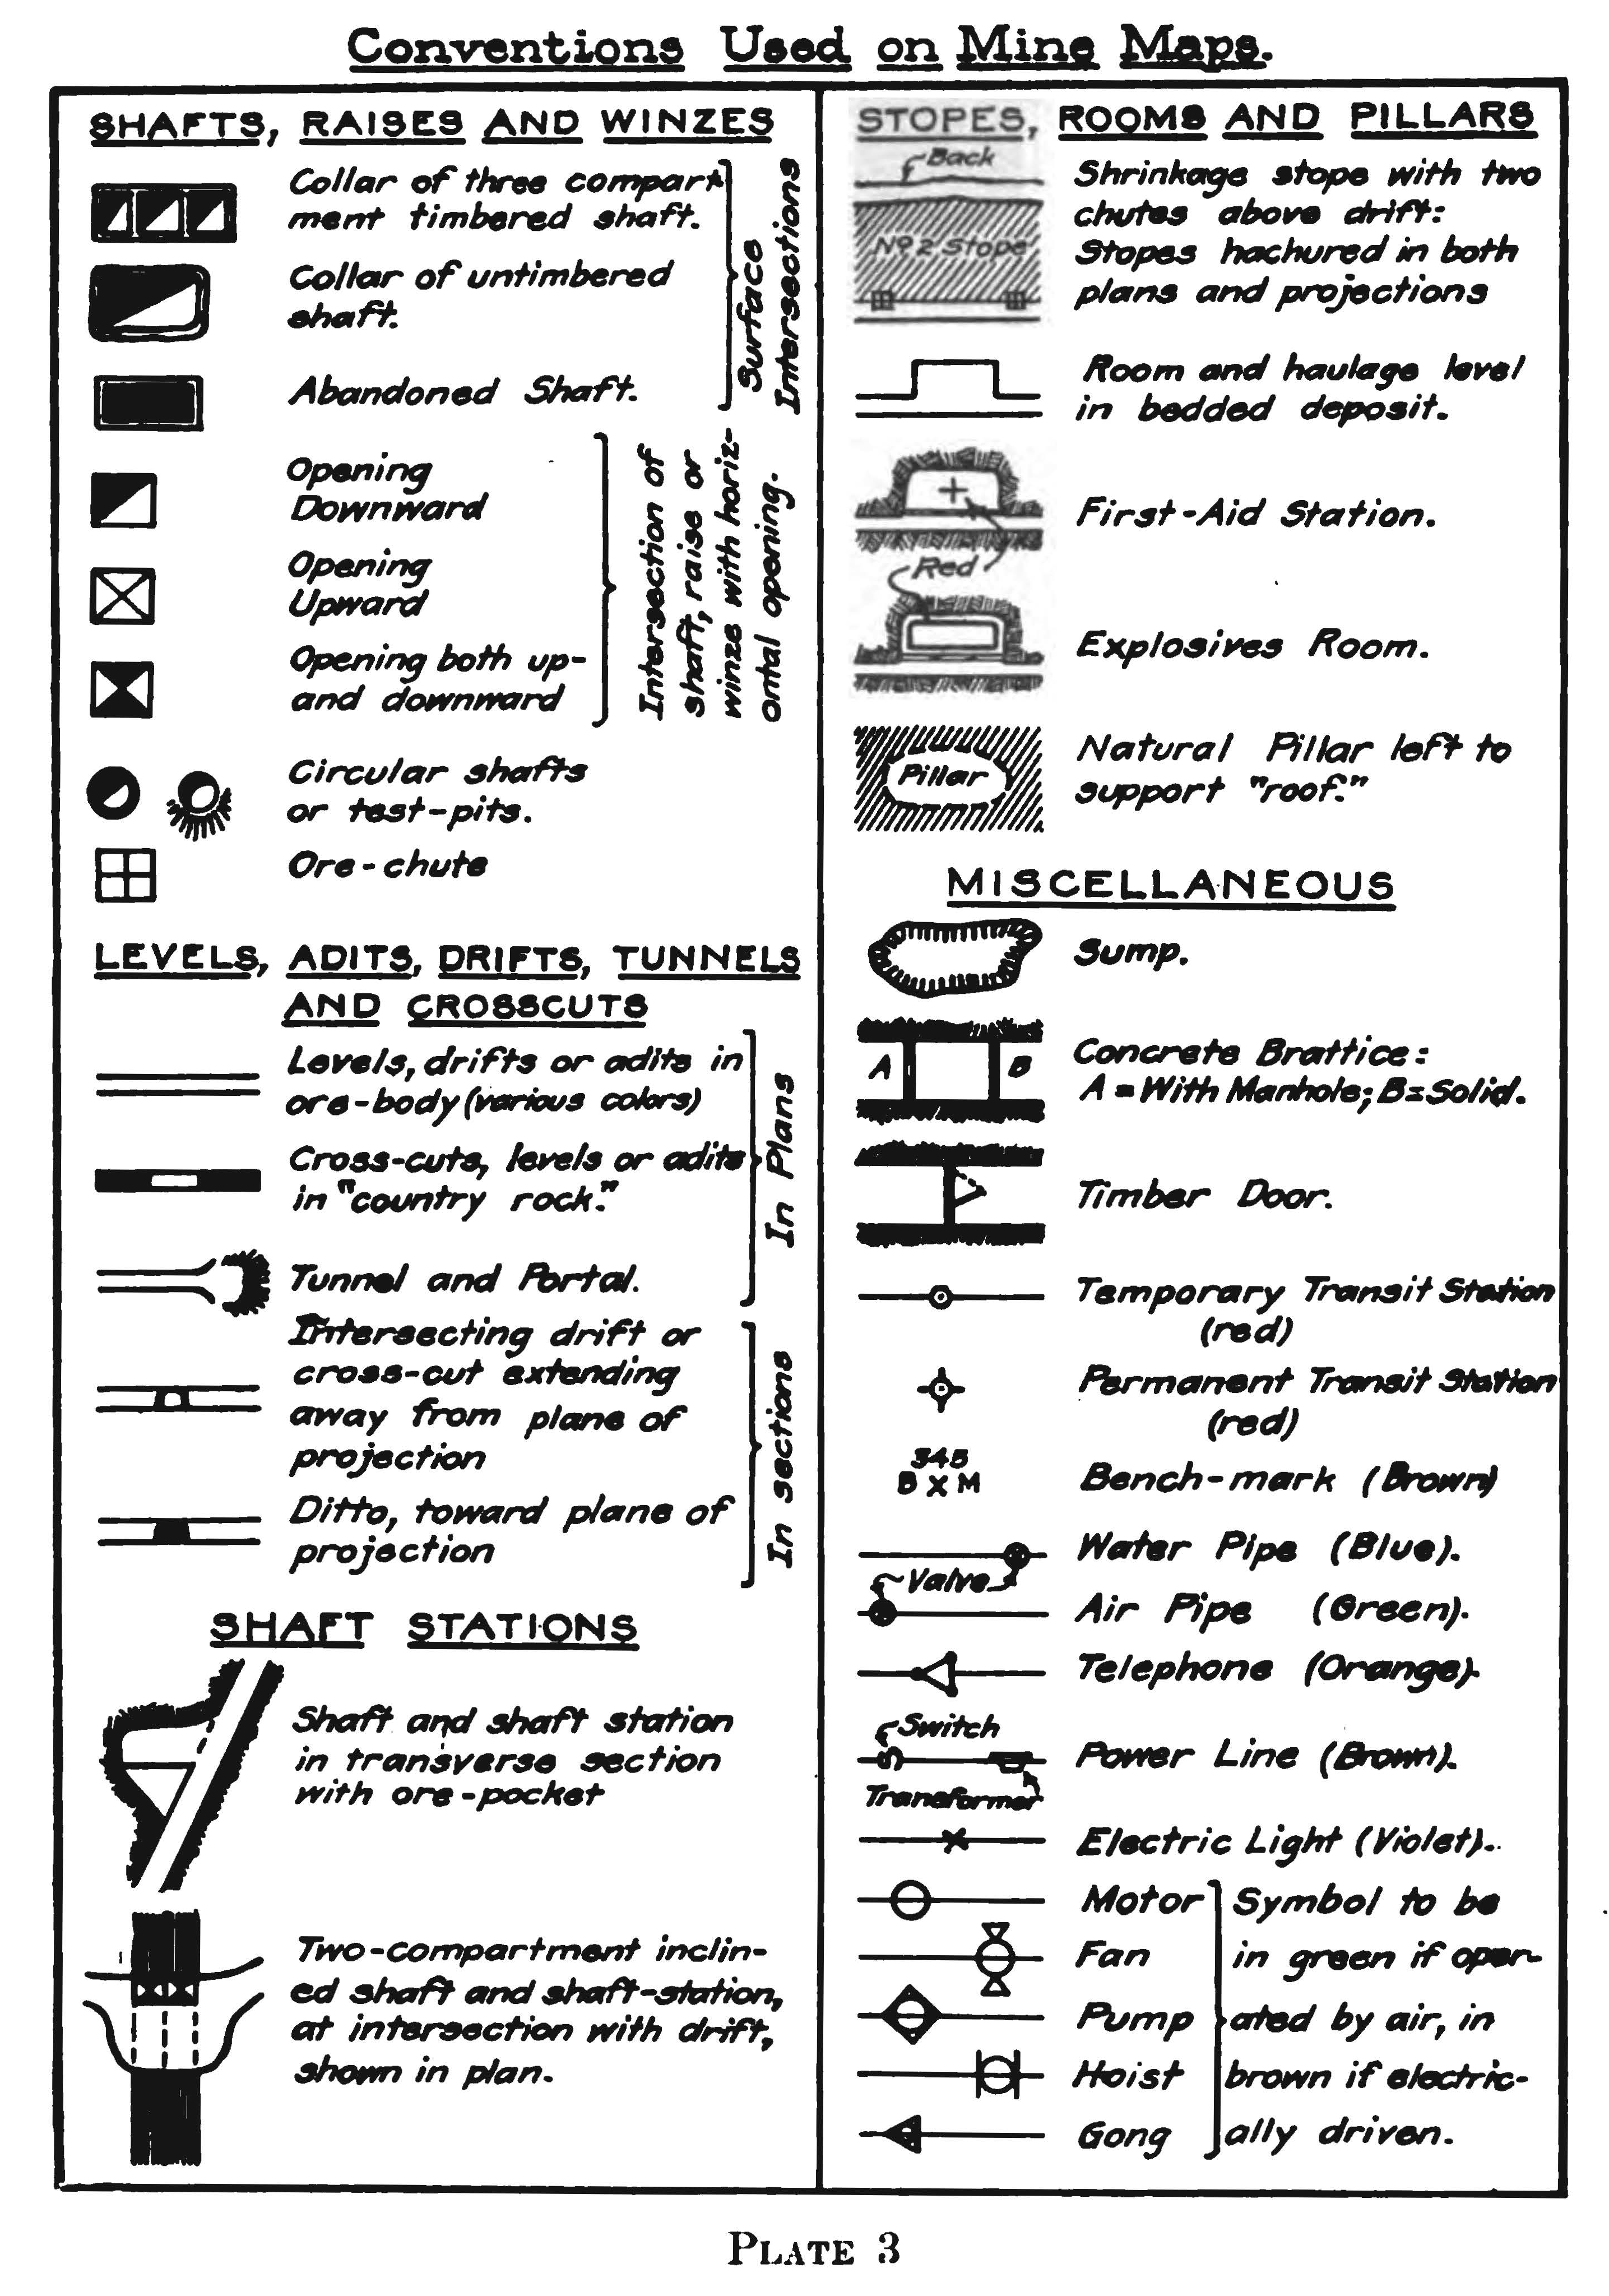 mine map symbols